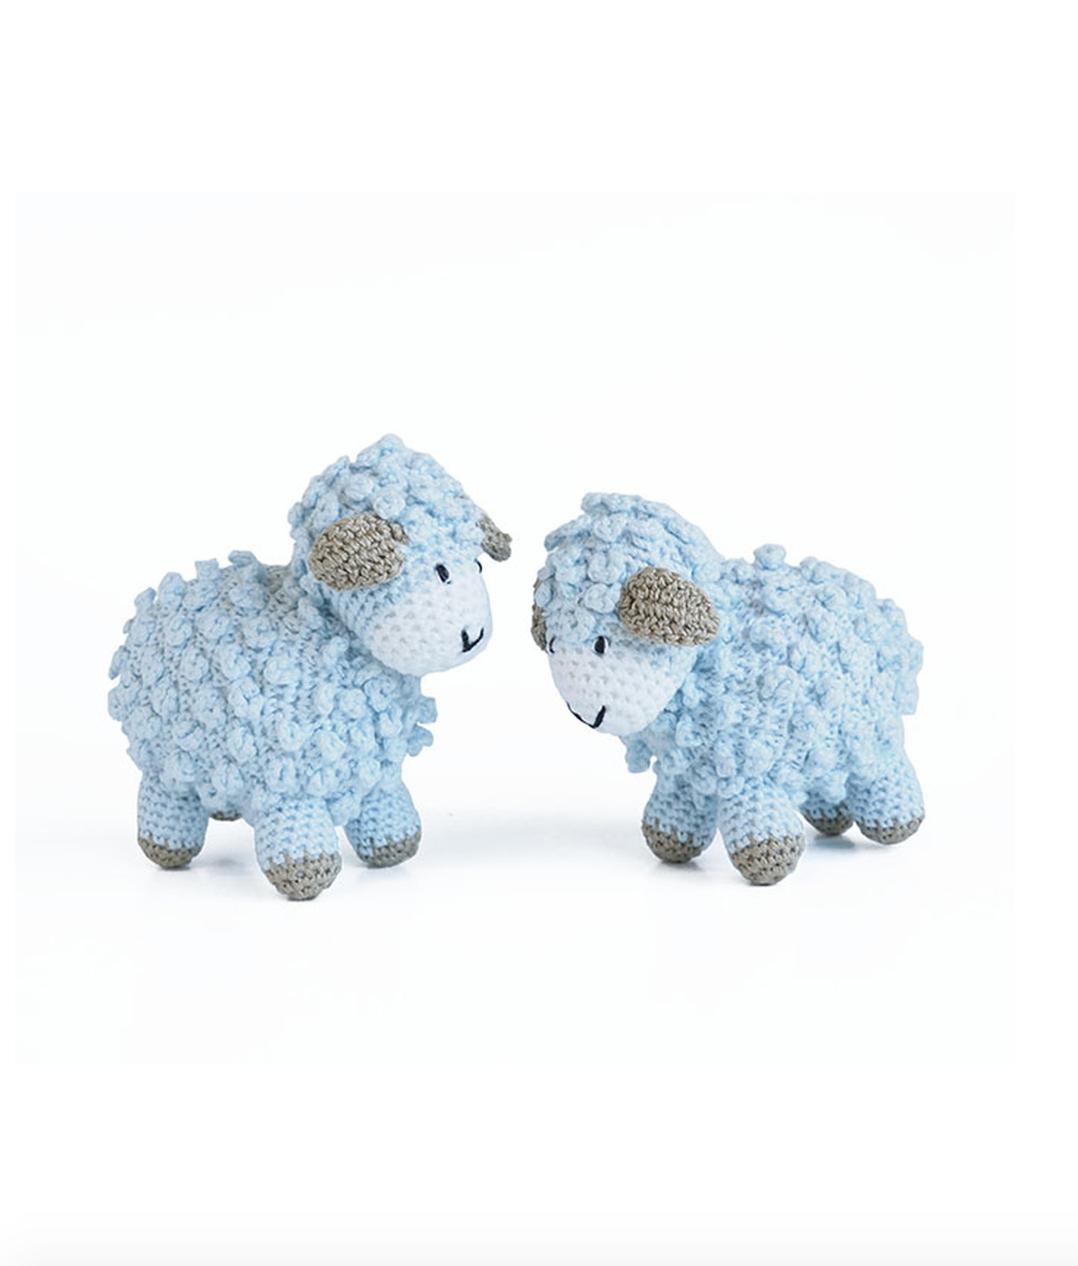 "Melange Little crochet sheep 4""x3.5"" - blue"